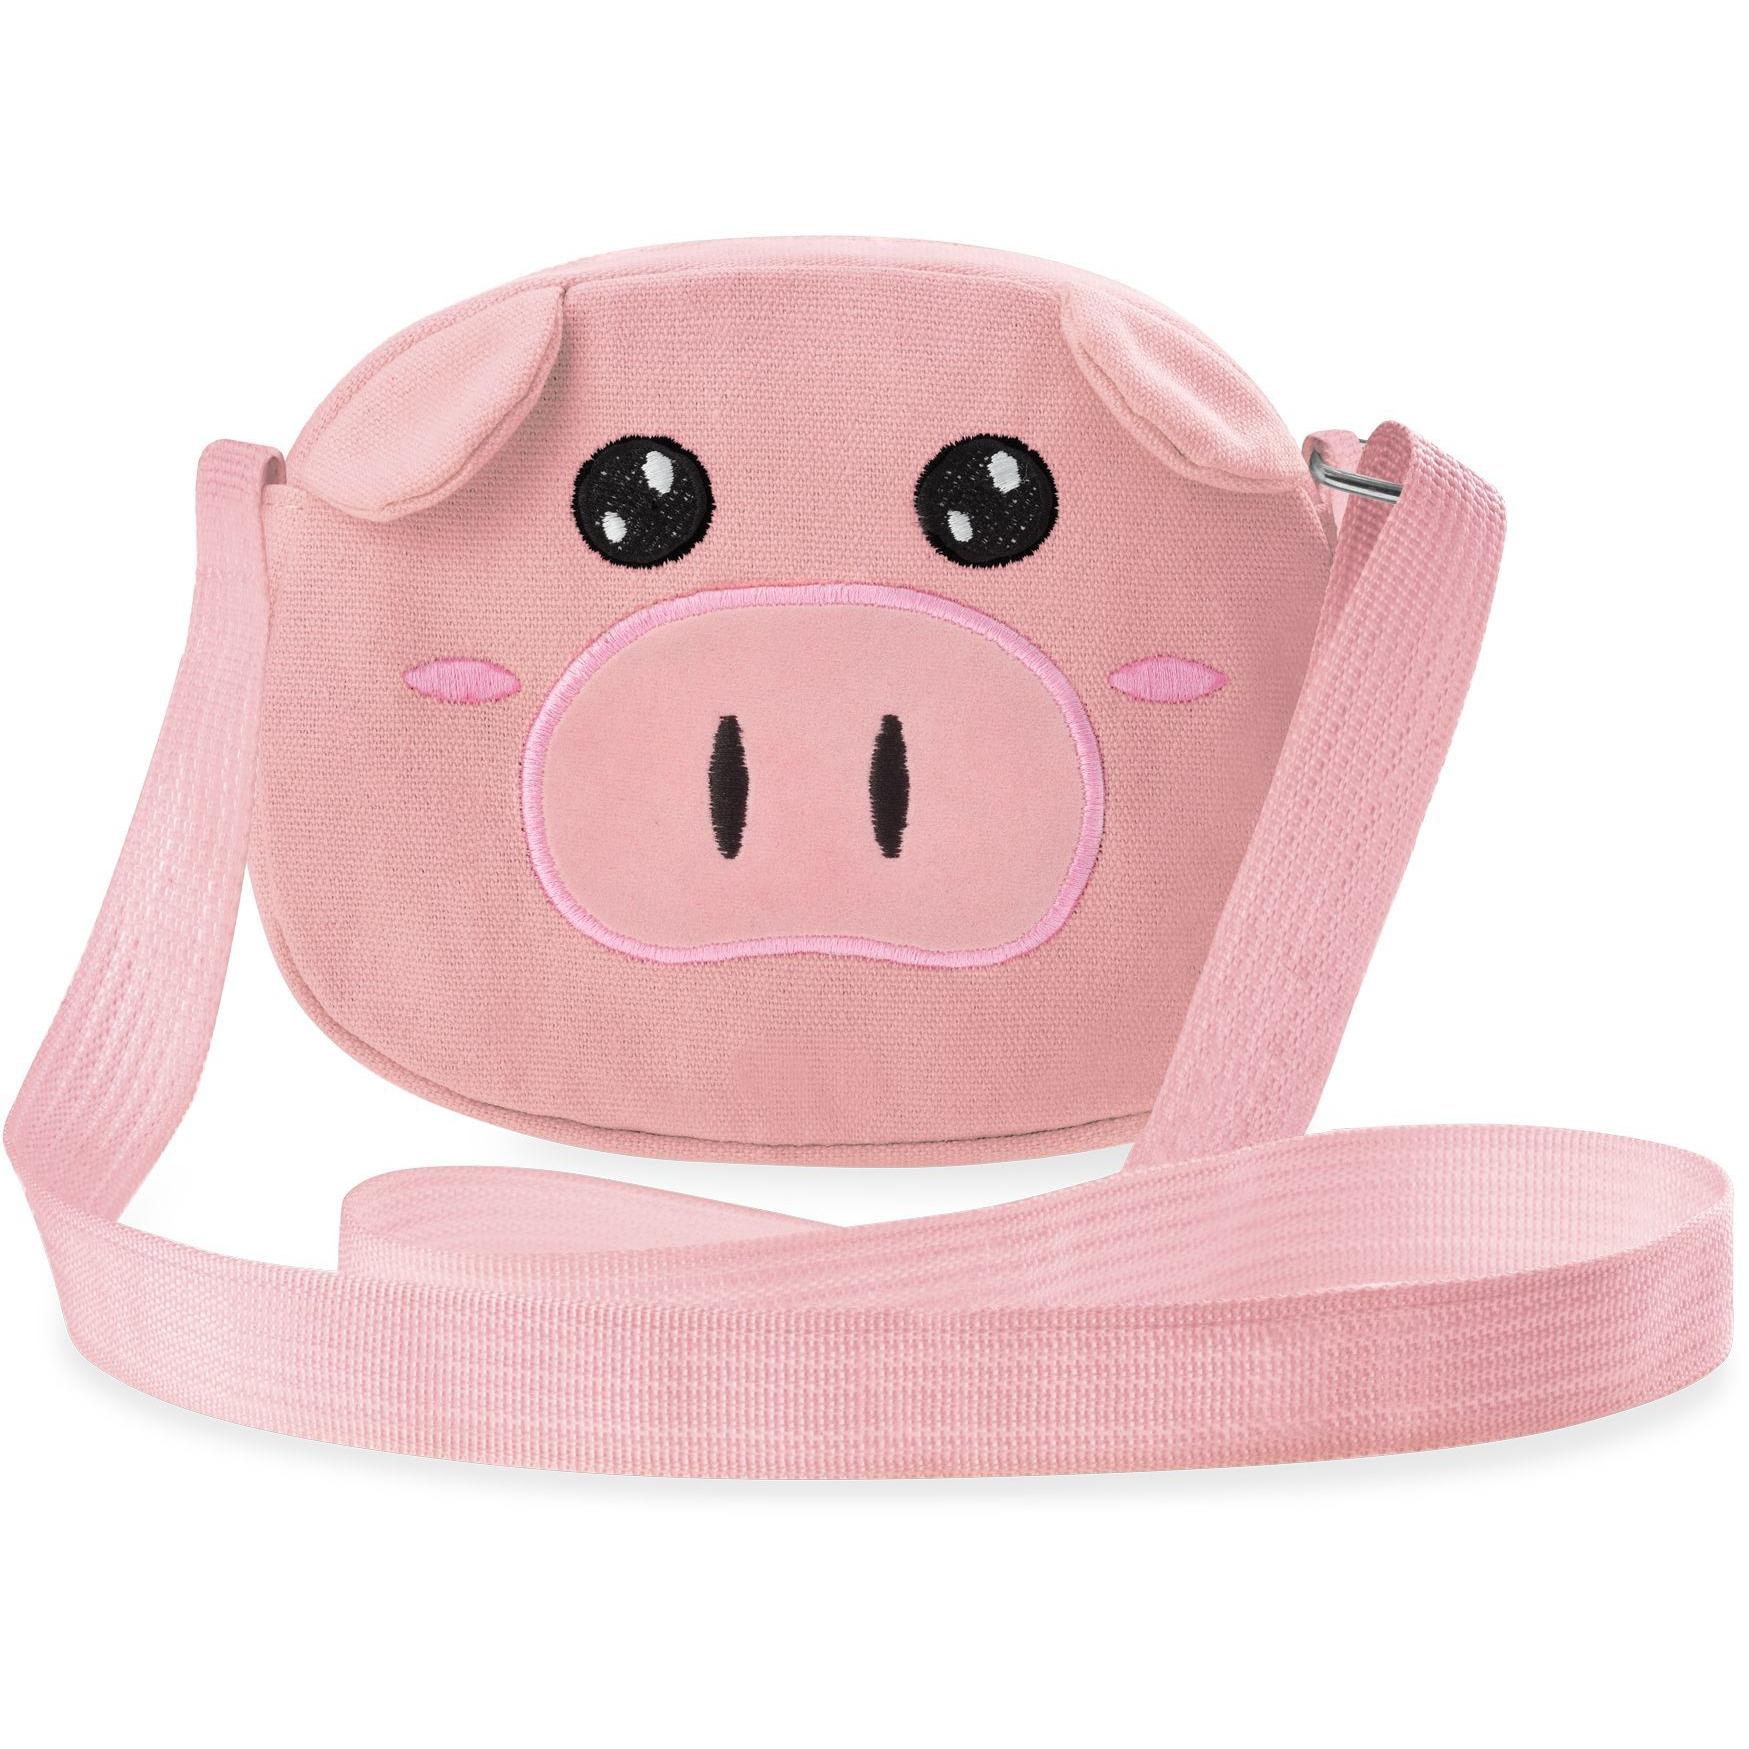 Dodatki i torebki dla dzieci